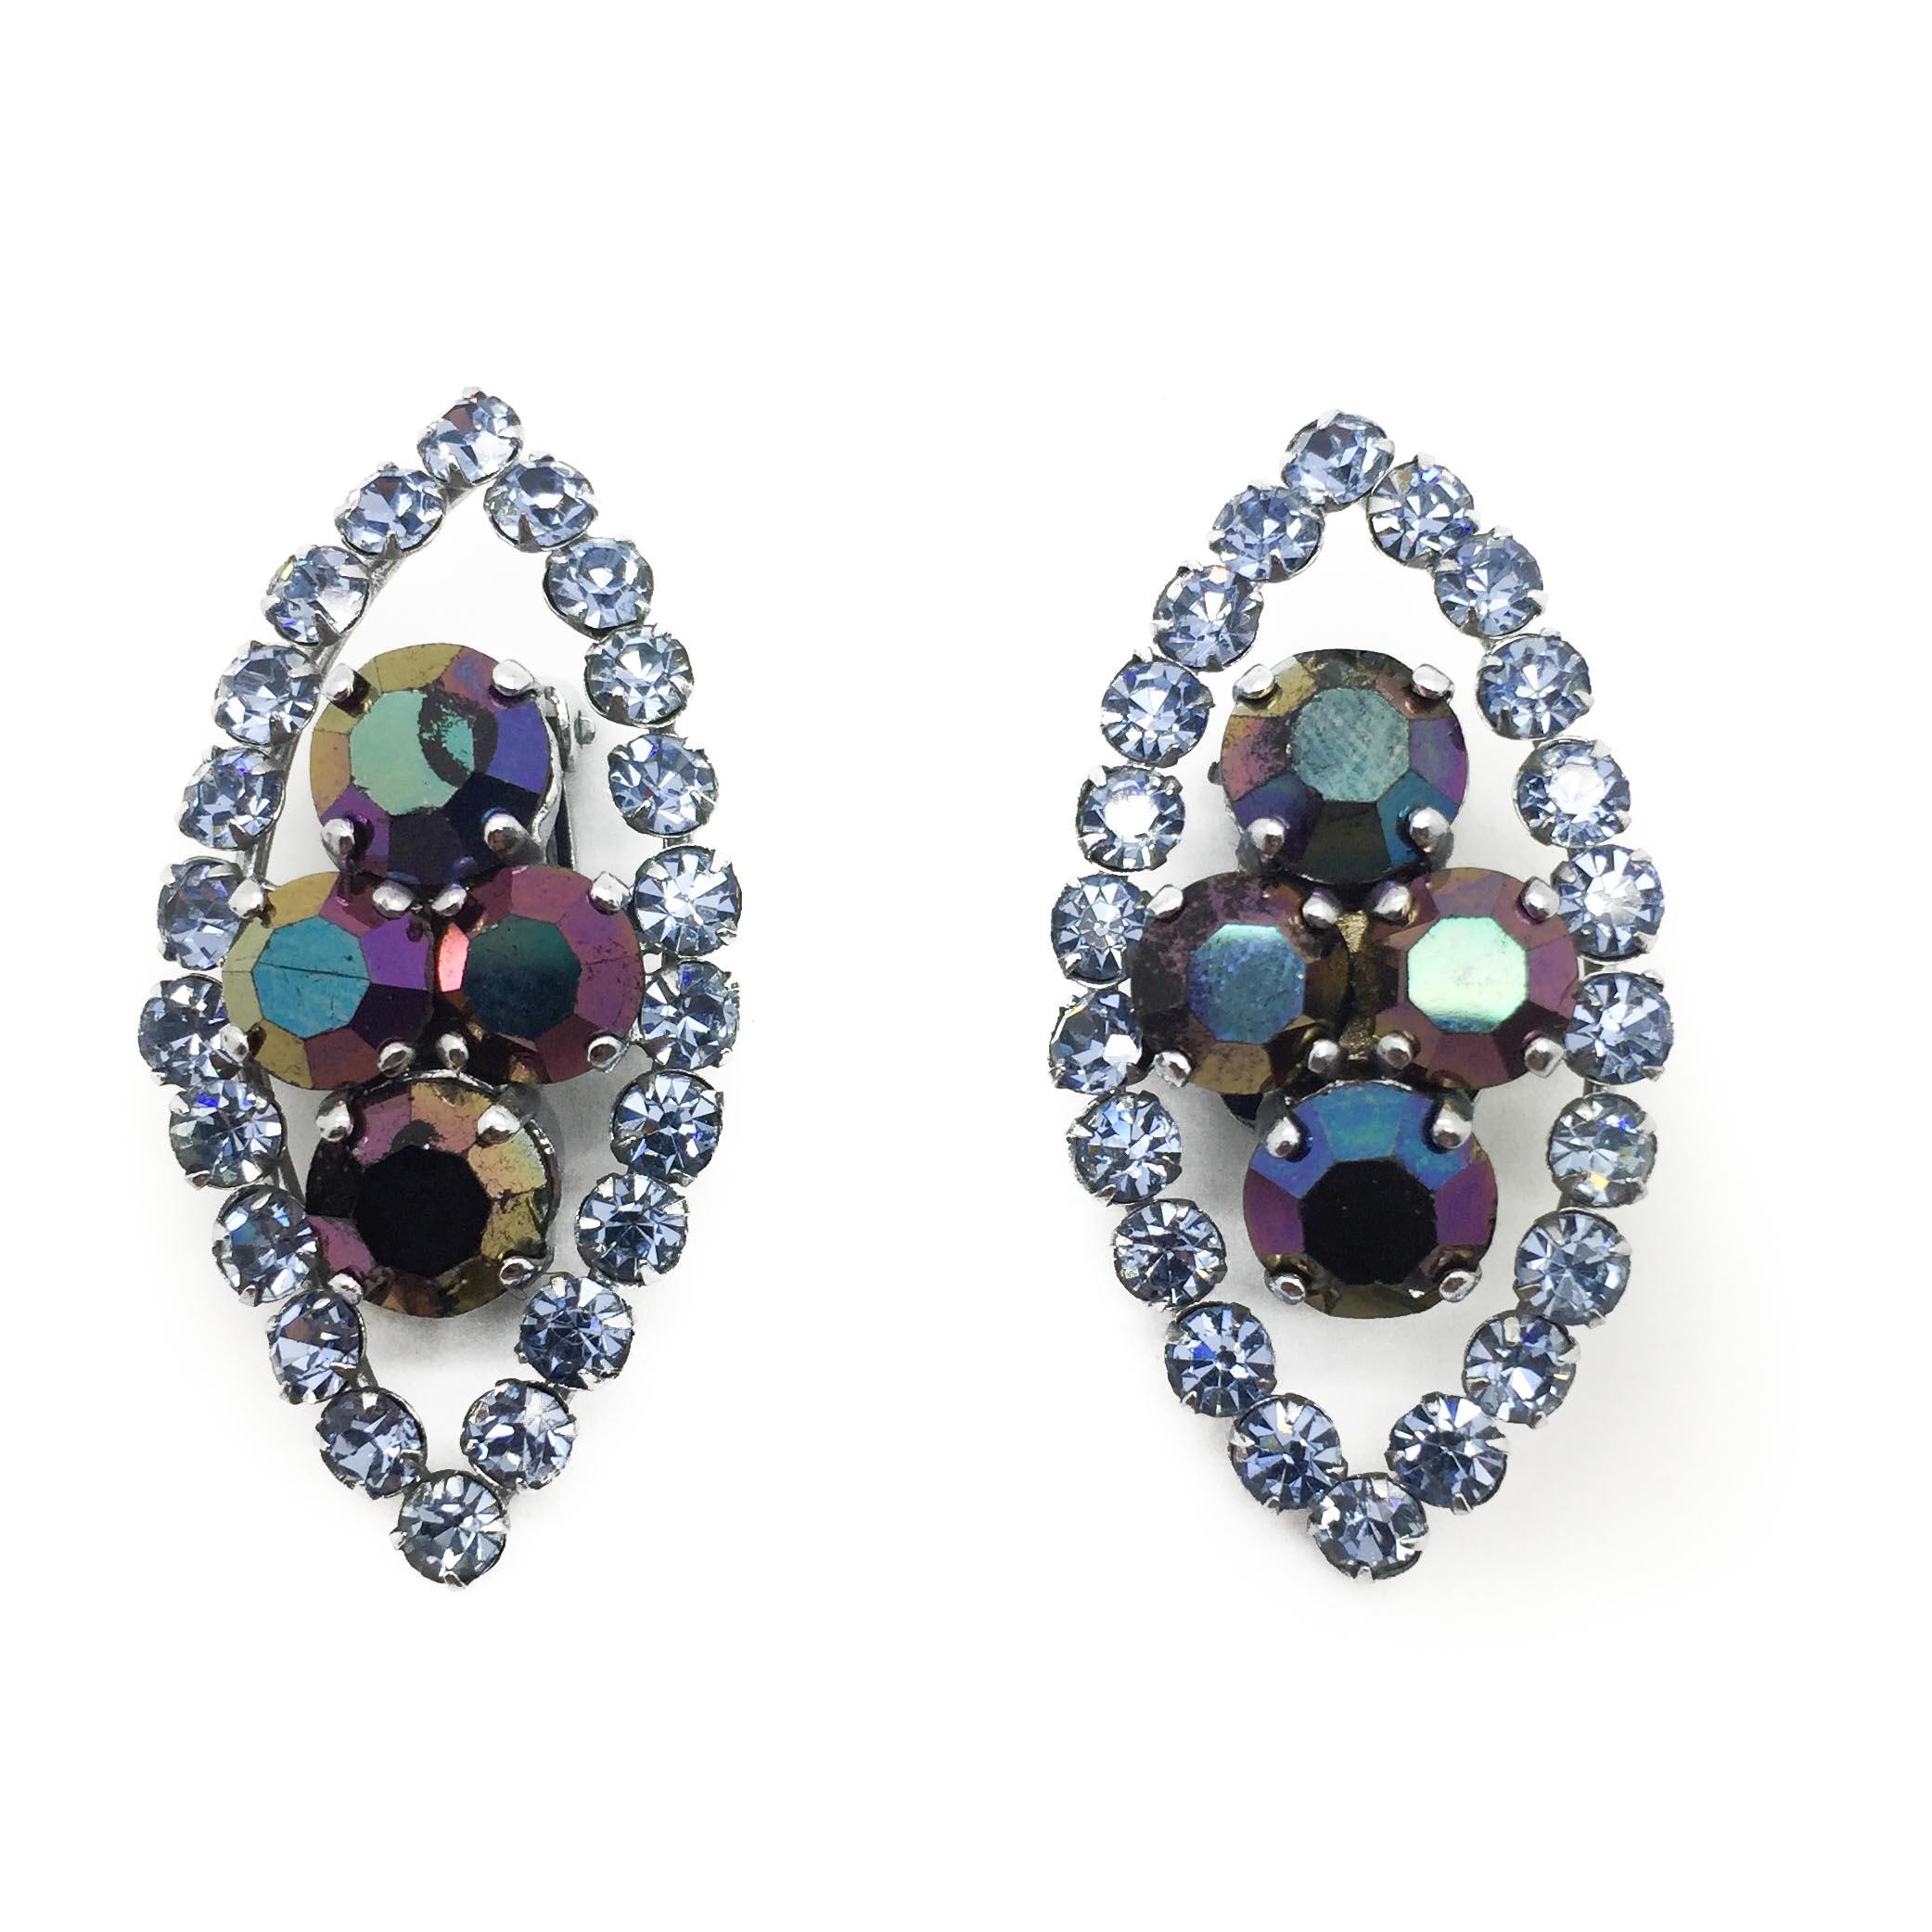 Dior 1950s Earrings, vintage dior, dior earrings, christian dior earrings, francesca cumani aintree